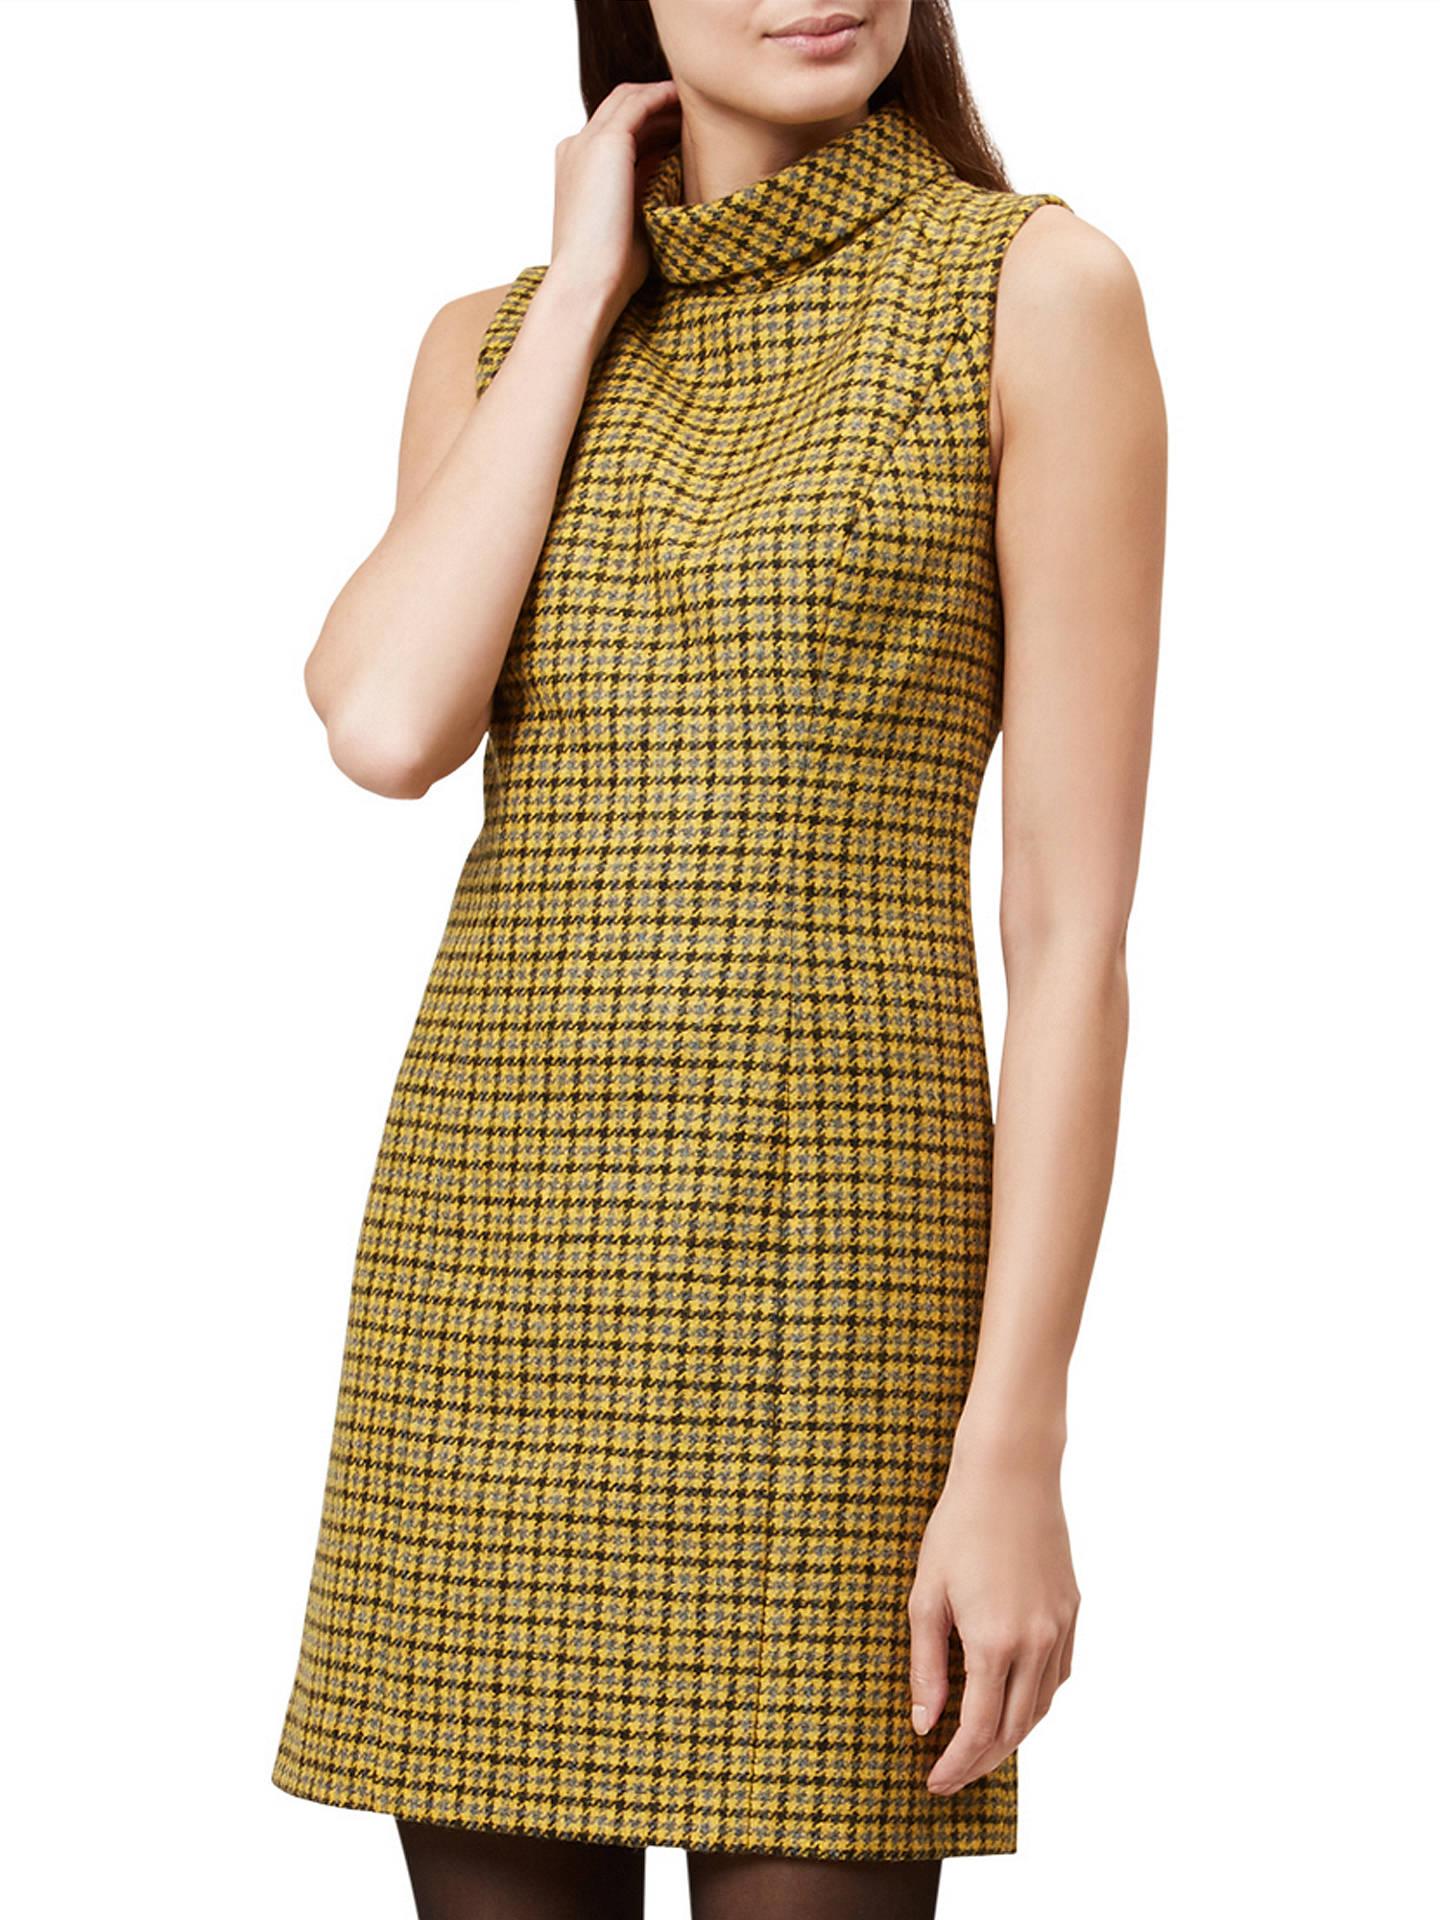 129a126cbd27 Buy Hobbs Dalby Wool Dress, Dandelion, 6 Online at johnlewis.com ...